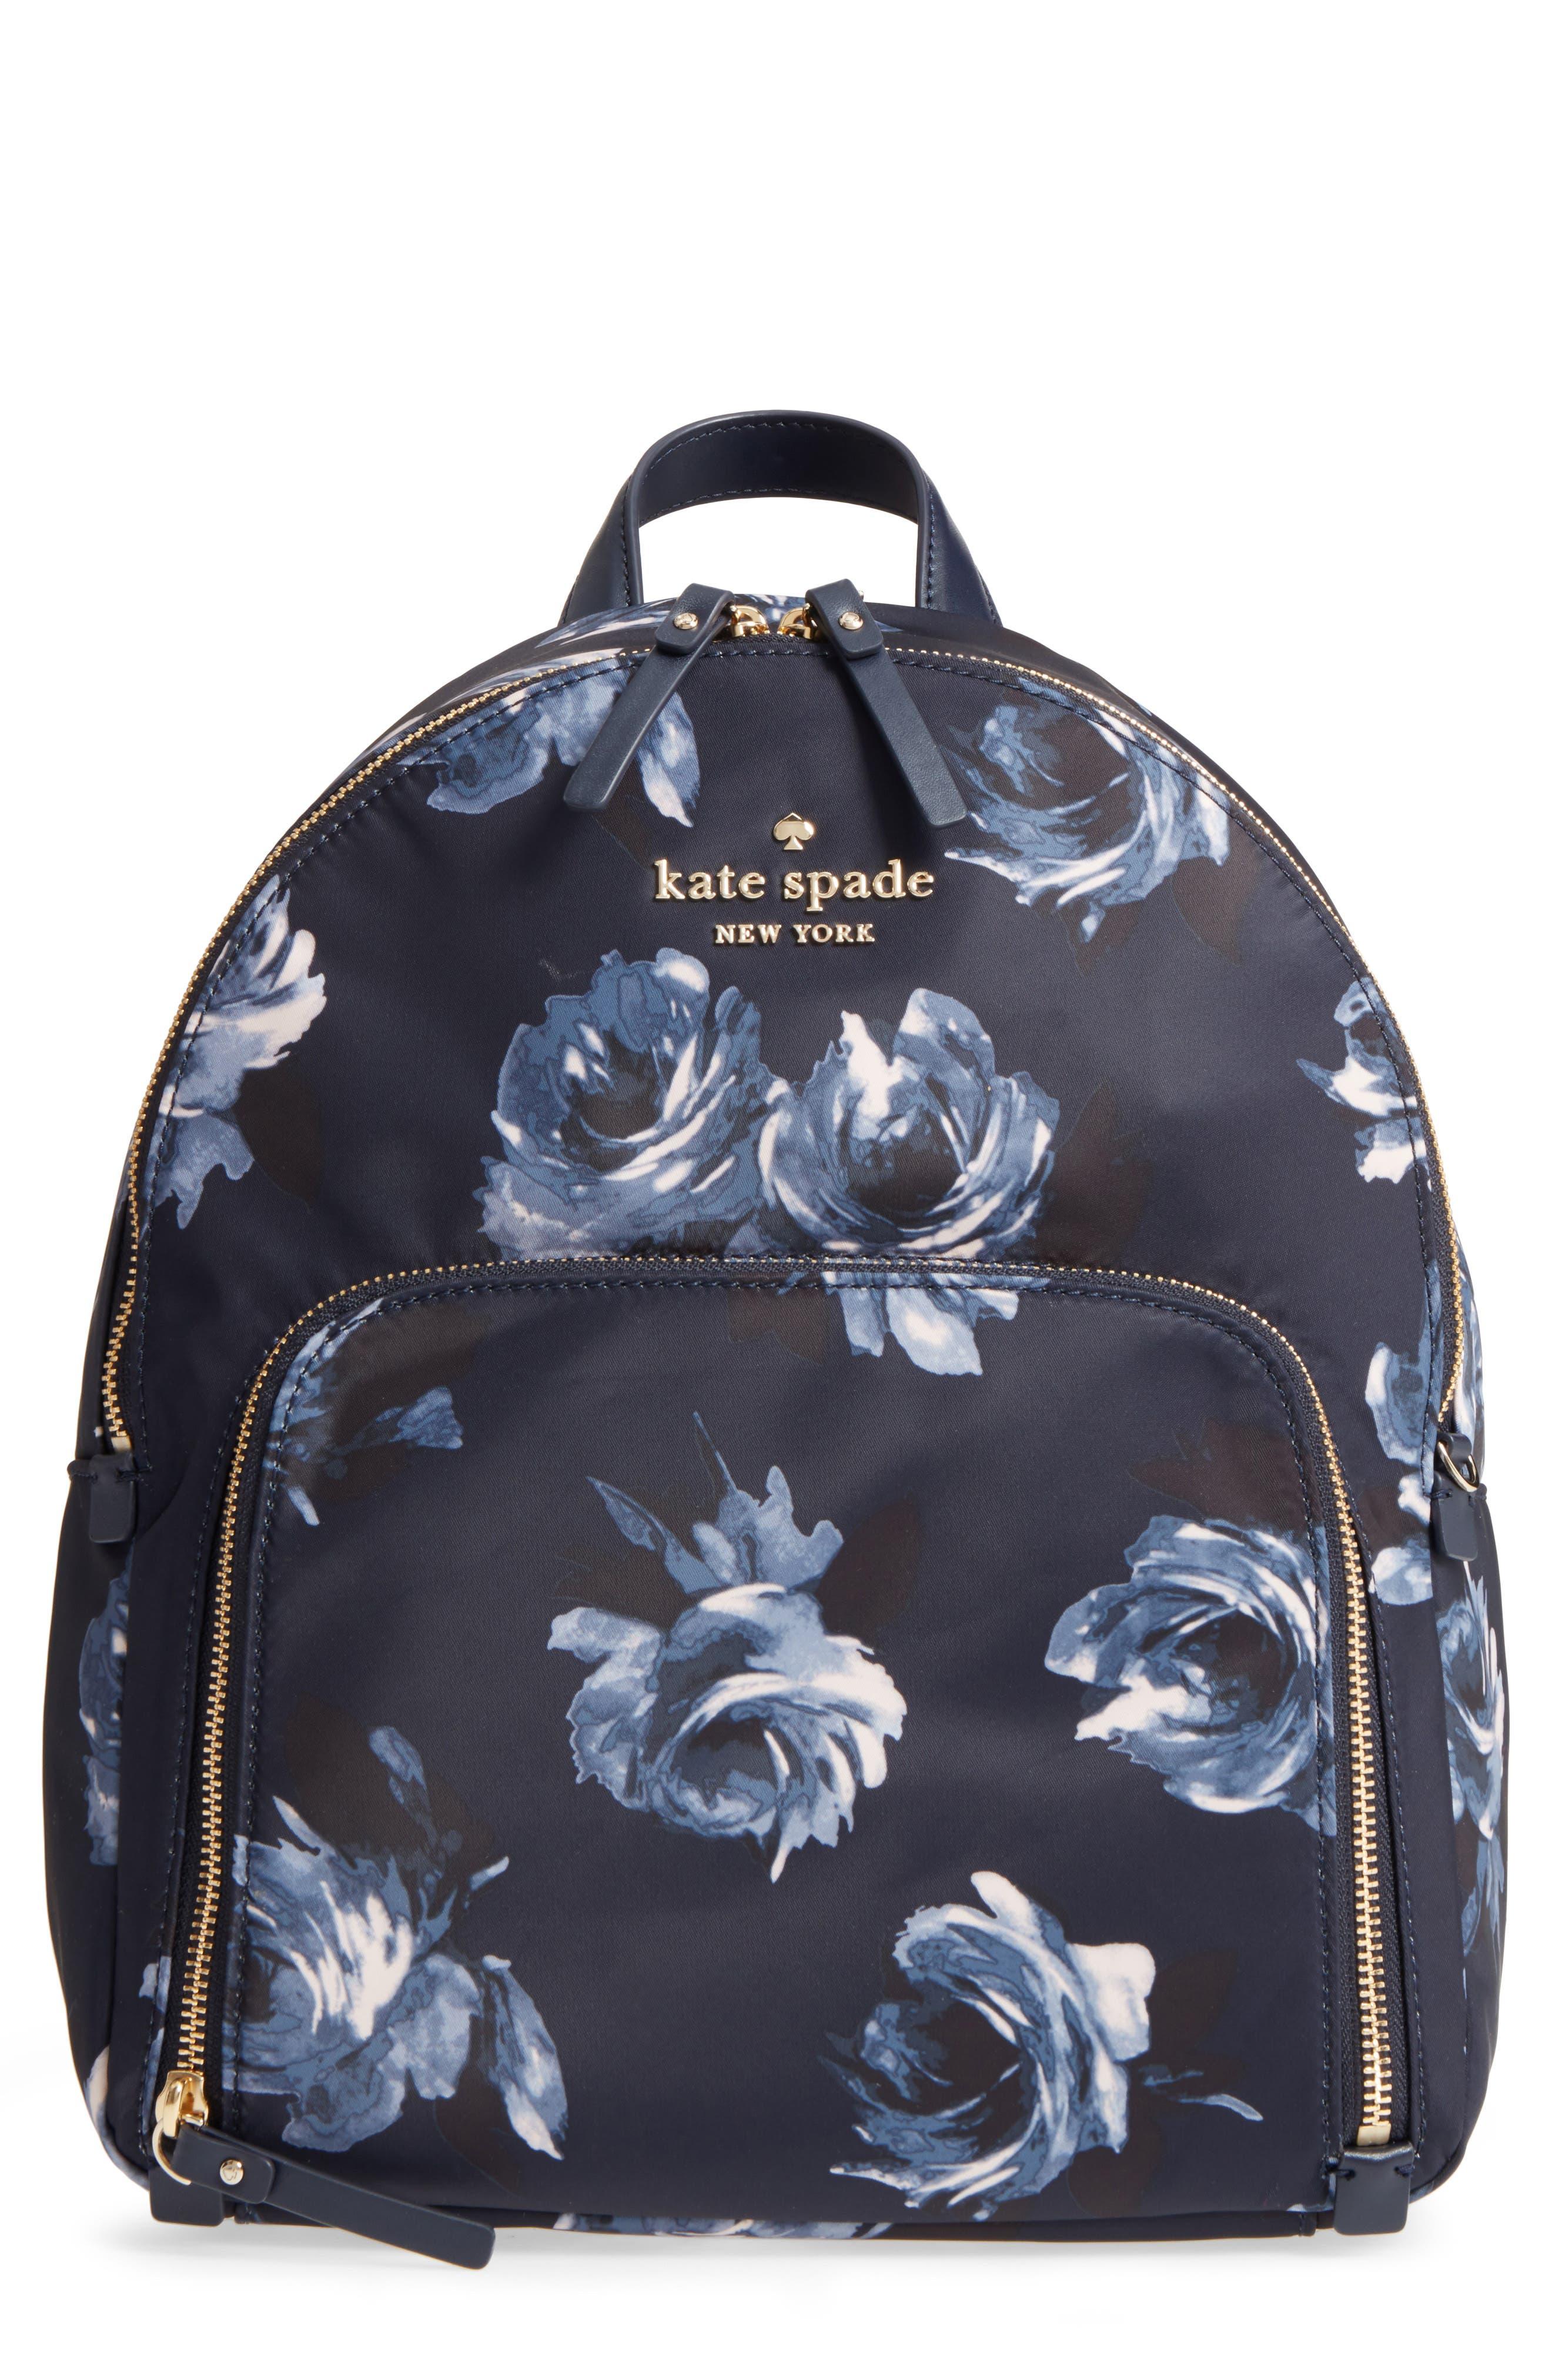 watson lane night rose hartley nylon backpack,                         Main,                         color, Night Rose